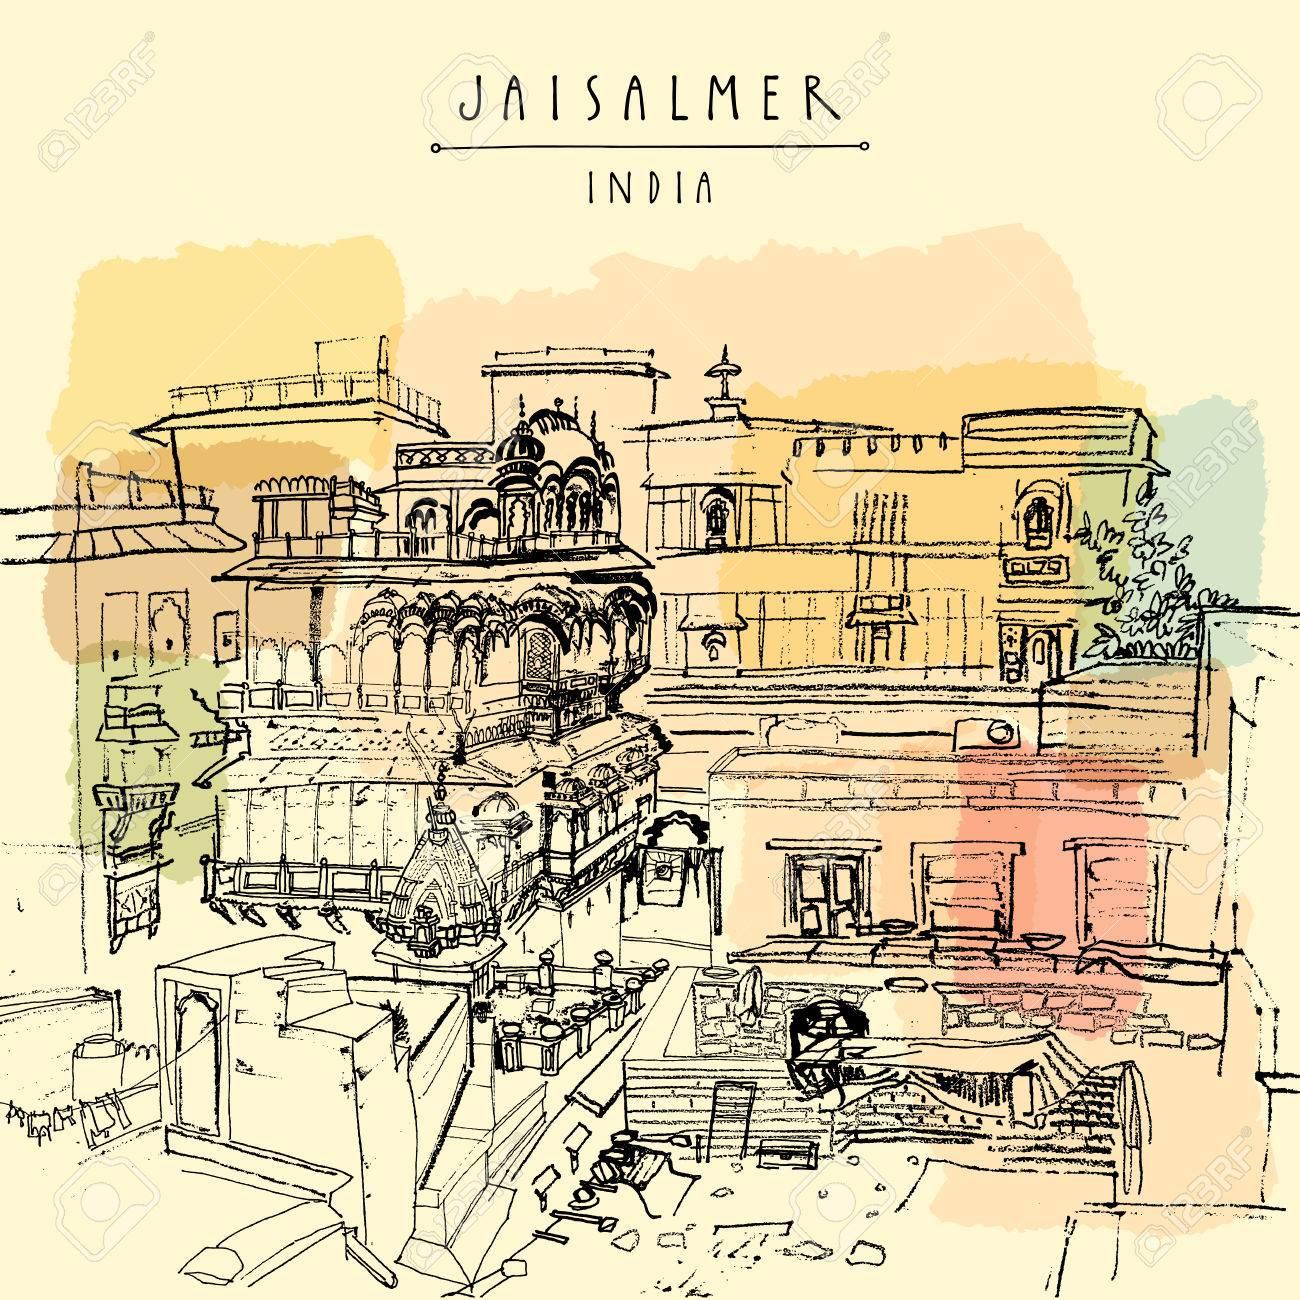 Carte Postale Inde.Palace A Jaisalmer Rajasthan Inde Vintage Touristique Main Livre Illustration Tiree Carte Postale Ou Poster Dans Le Vecteur